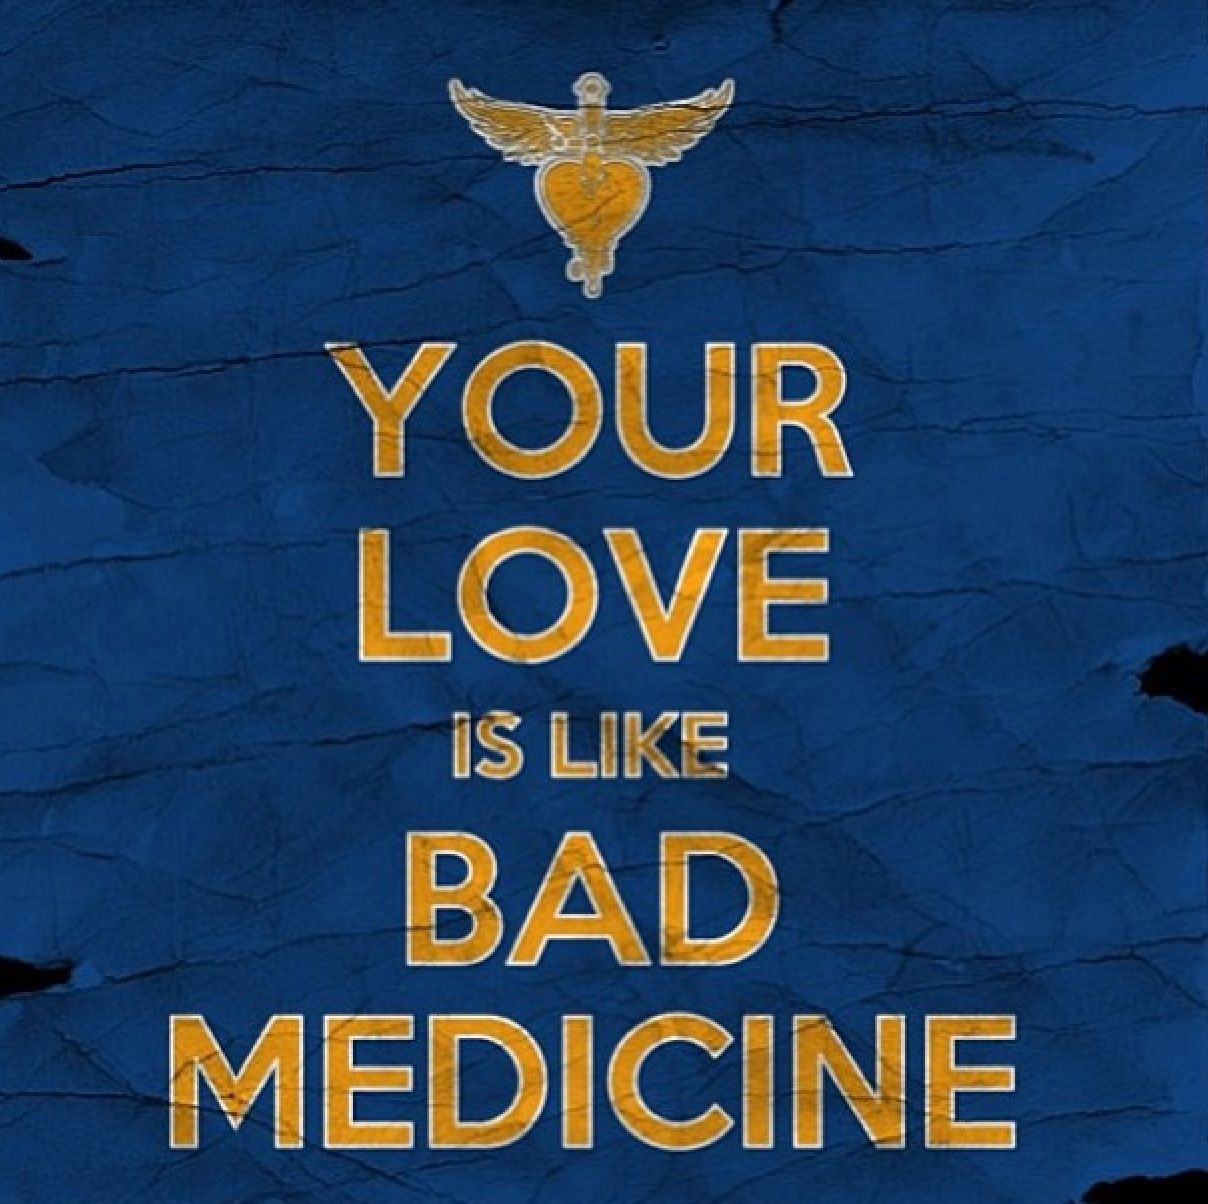 Category - Bad Medicine